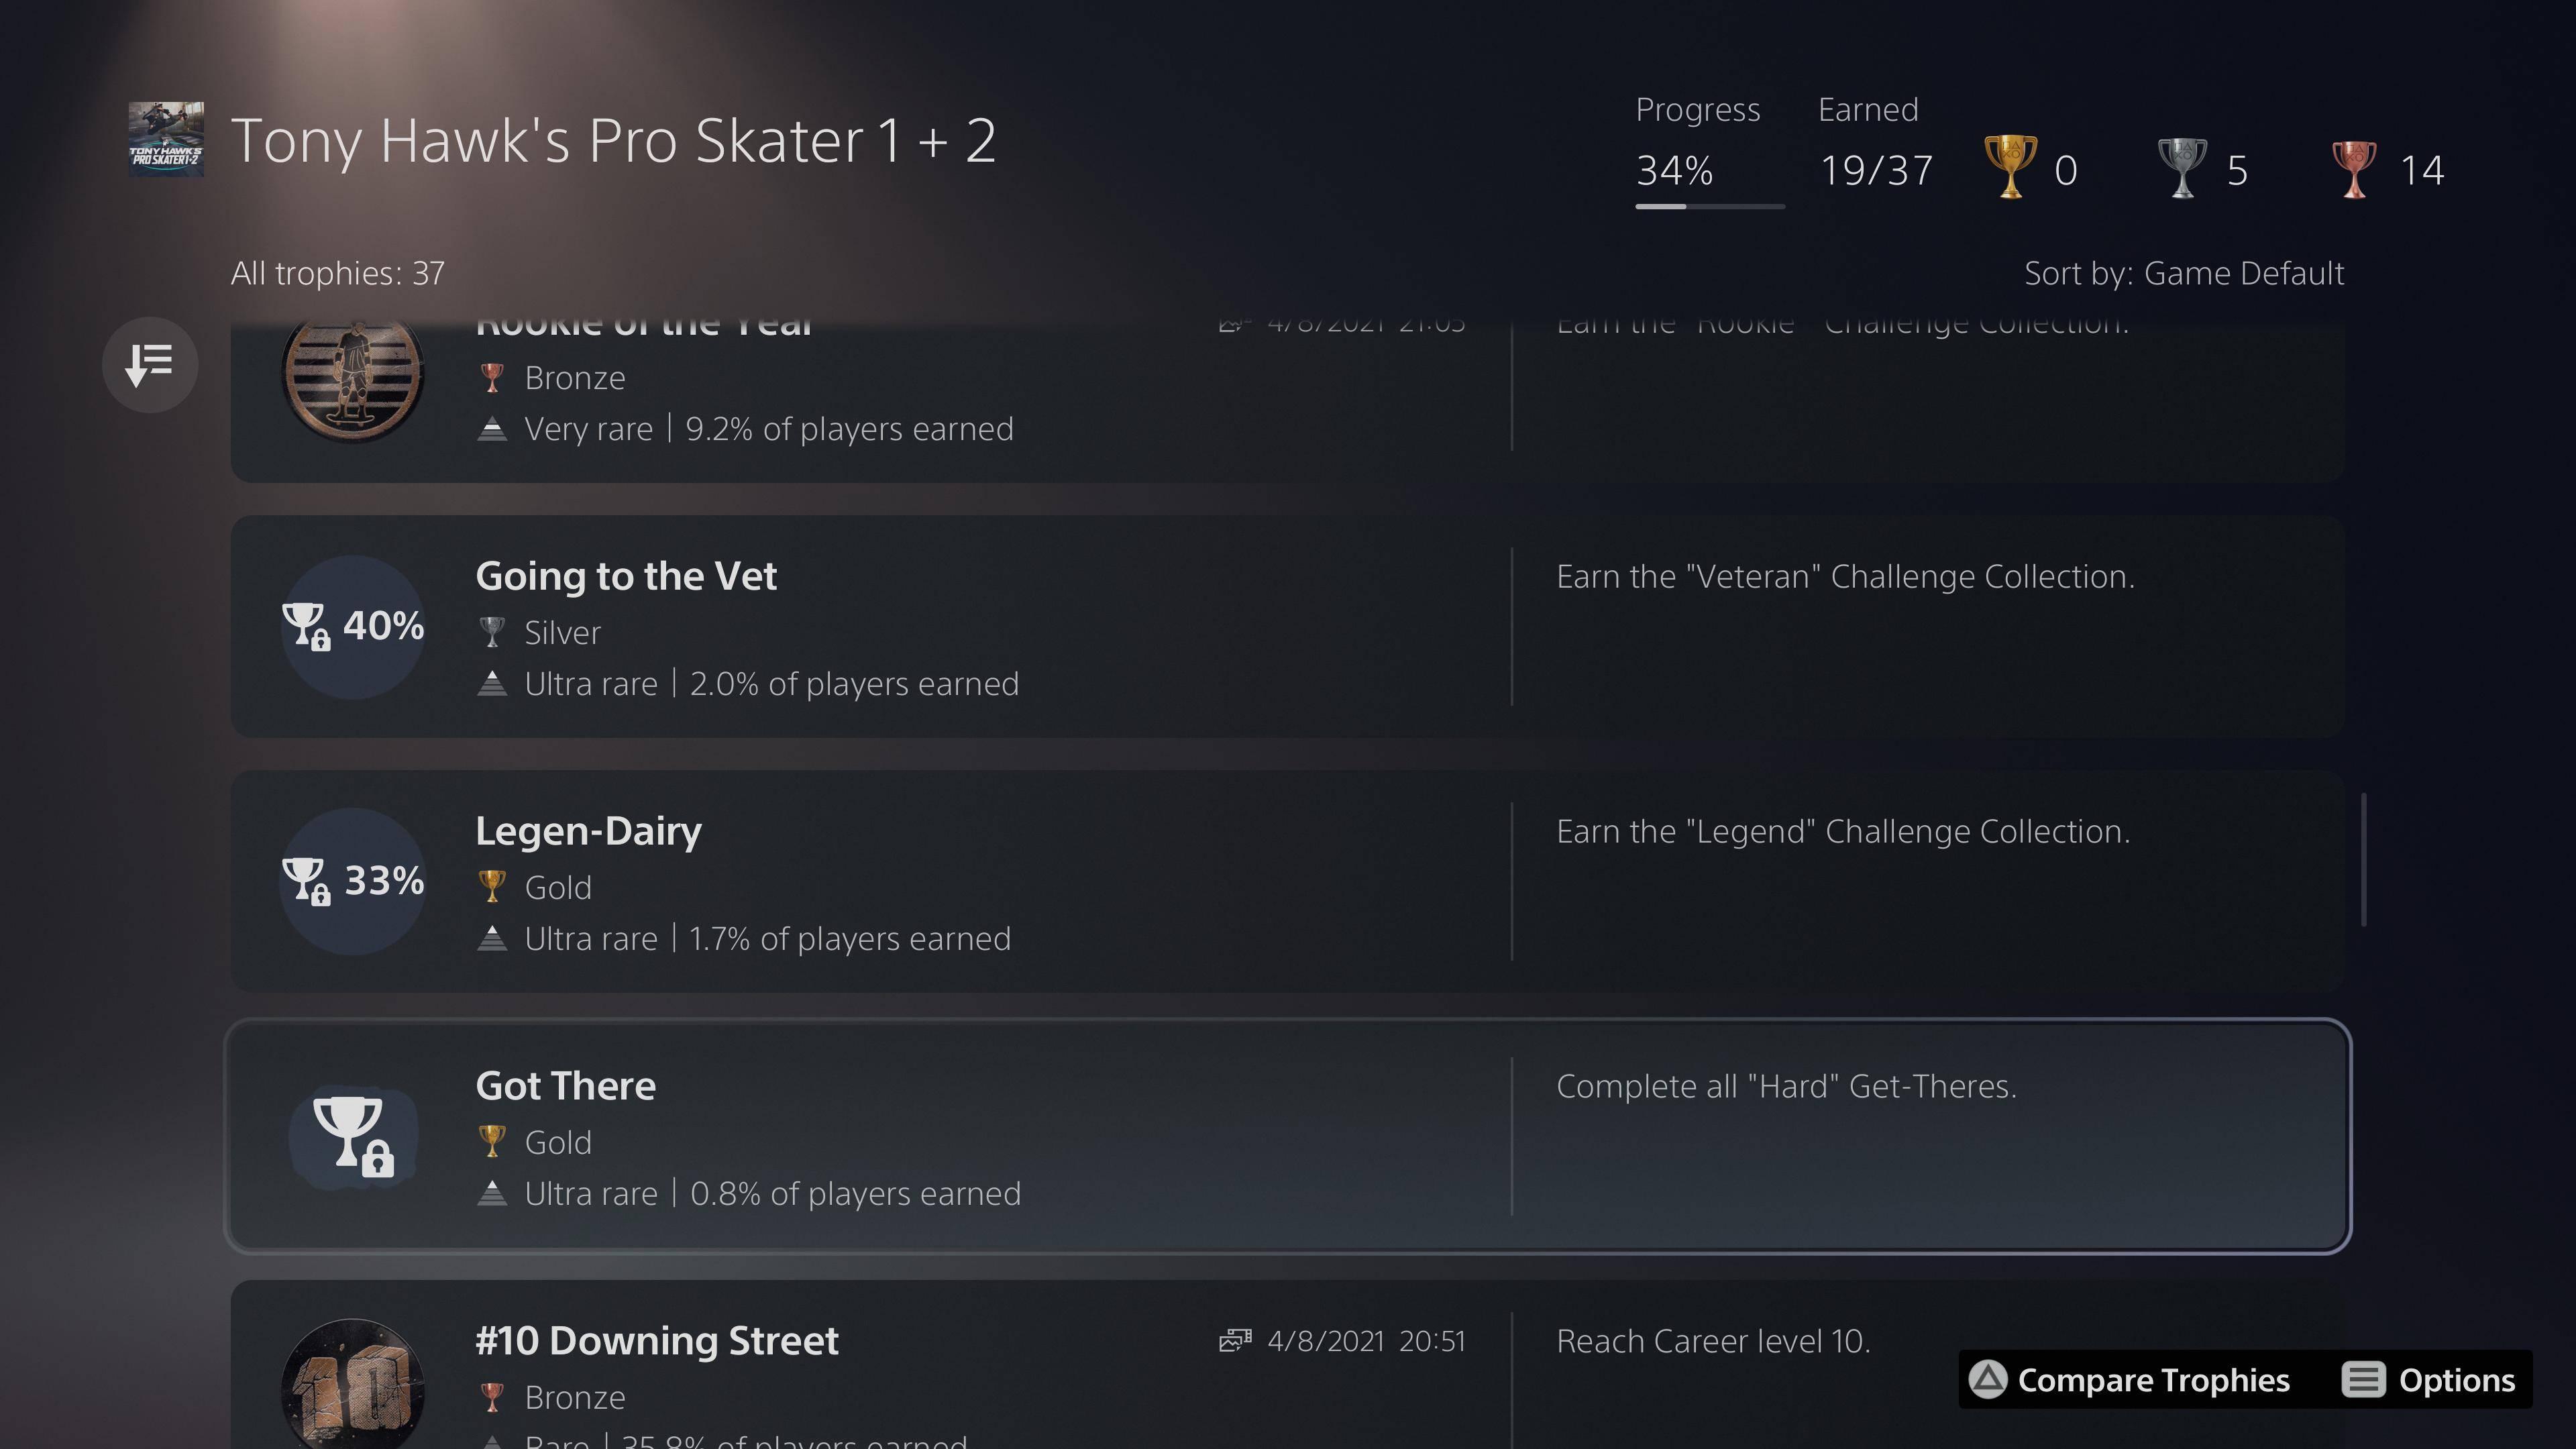 Tony Hawk's Pro Skater 1 + 2 Trophy list on PS5